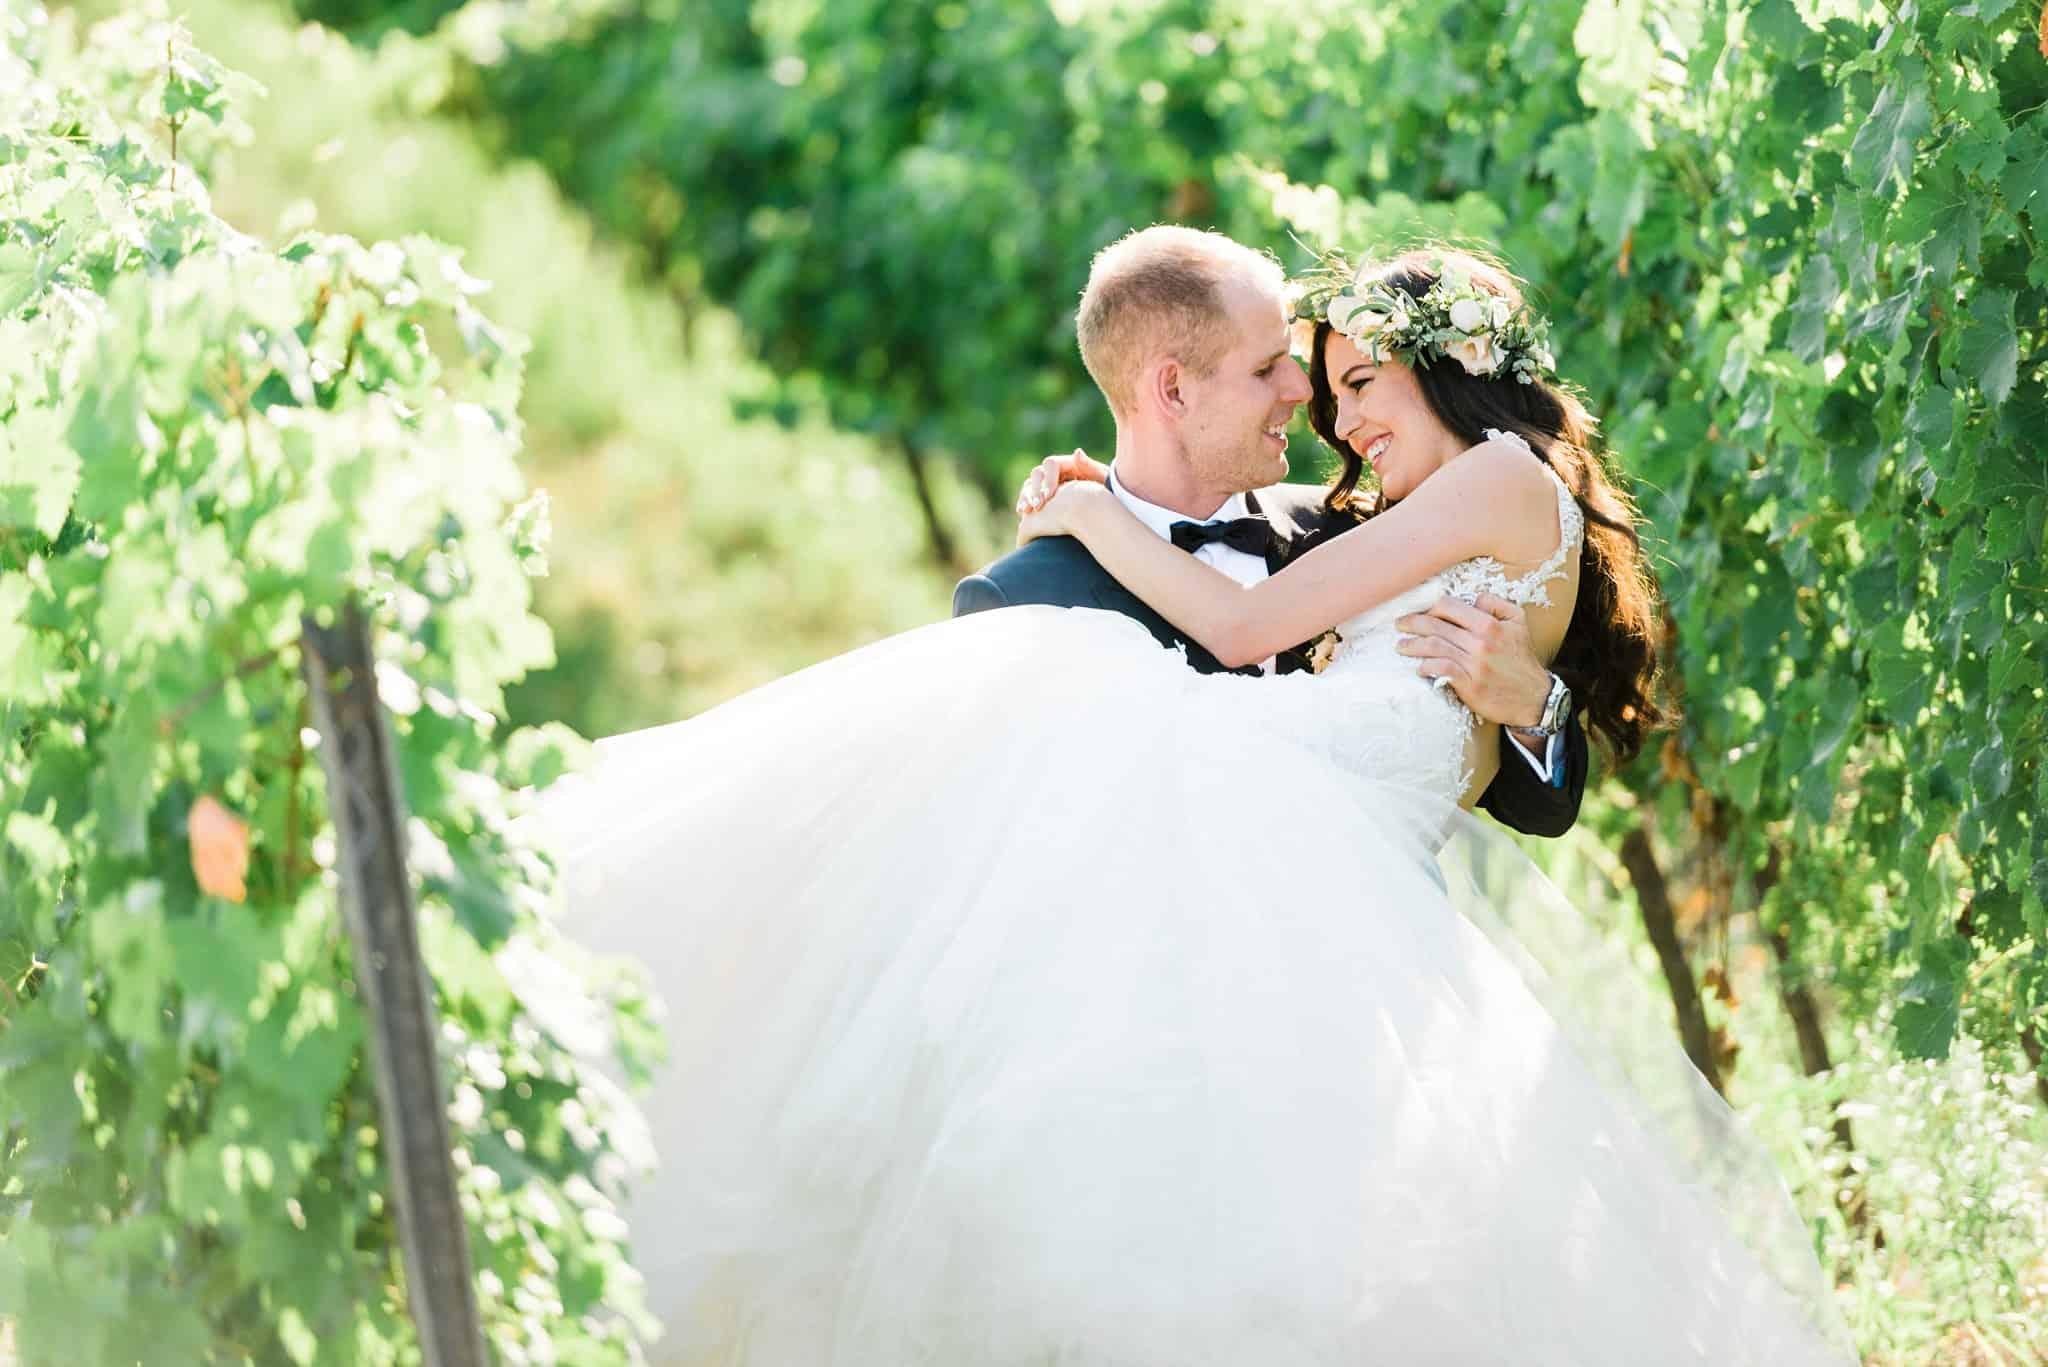 Wedoverhills_Prewedding_Film_Photographer_Vineyard_Wedding_0026